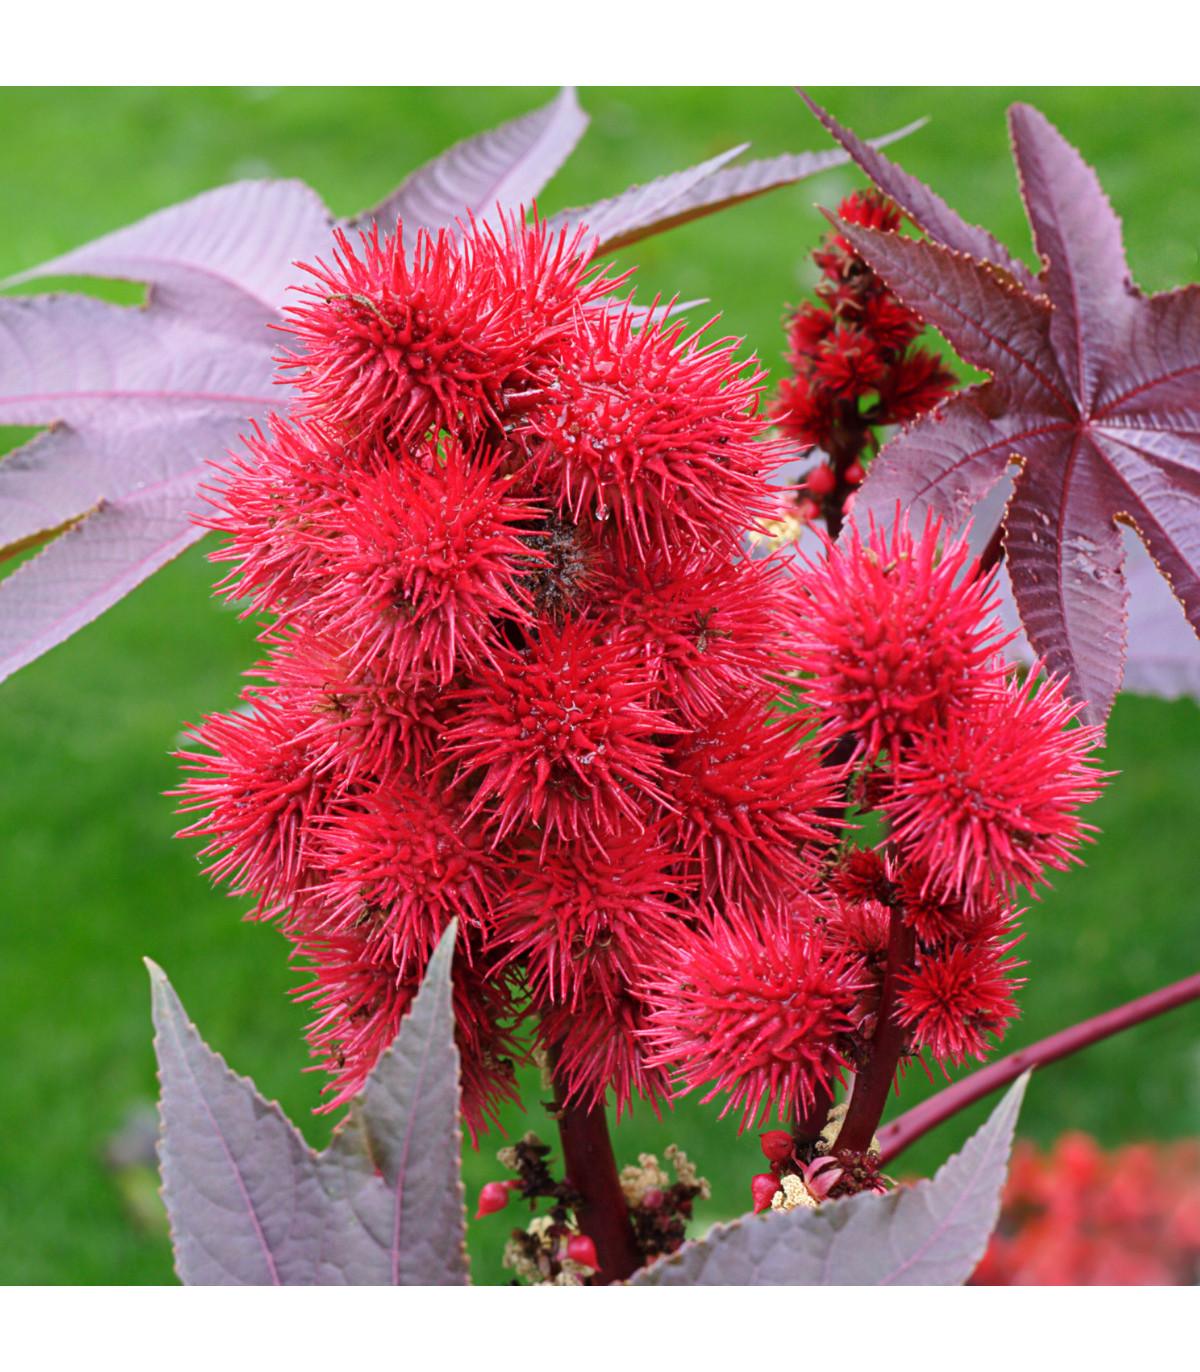 Skořec obecný - semínka Skořce - rostlina Ricinus communis - 3 ks